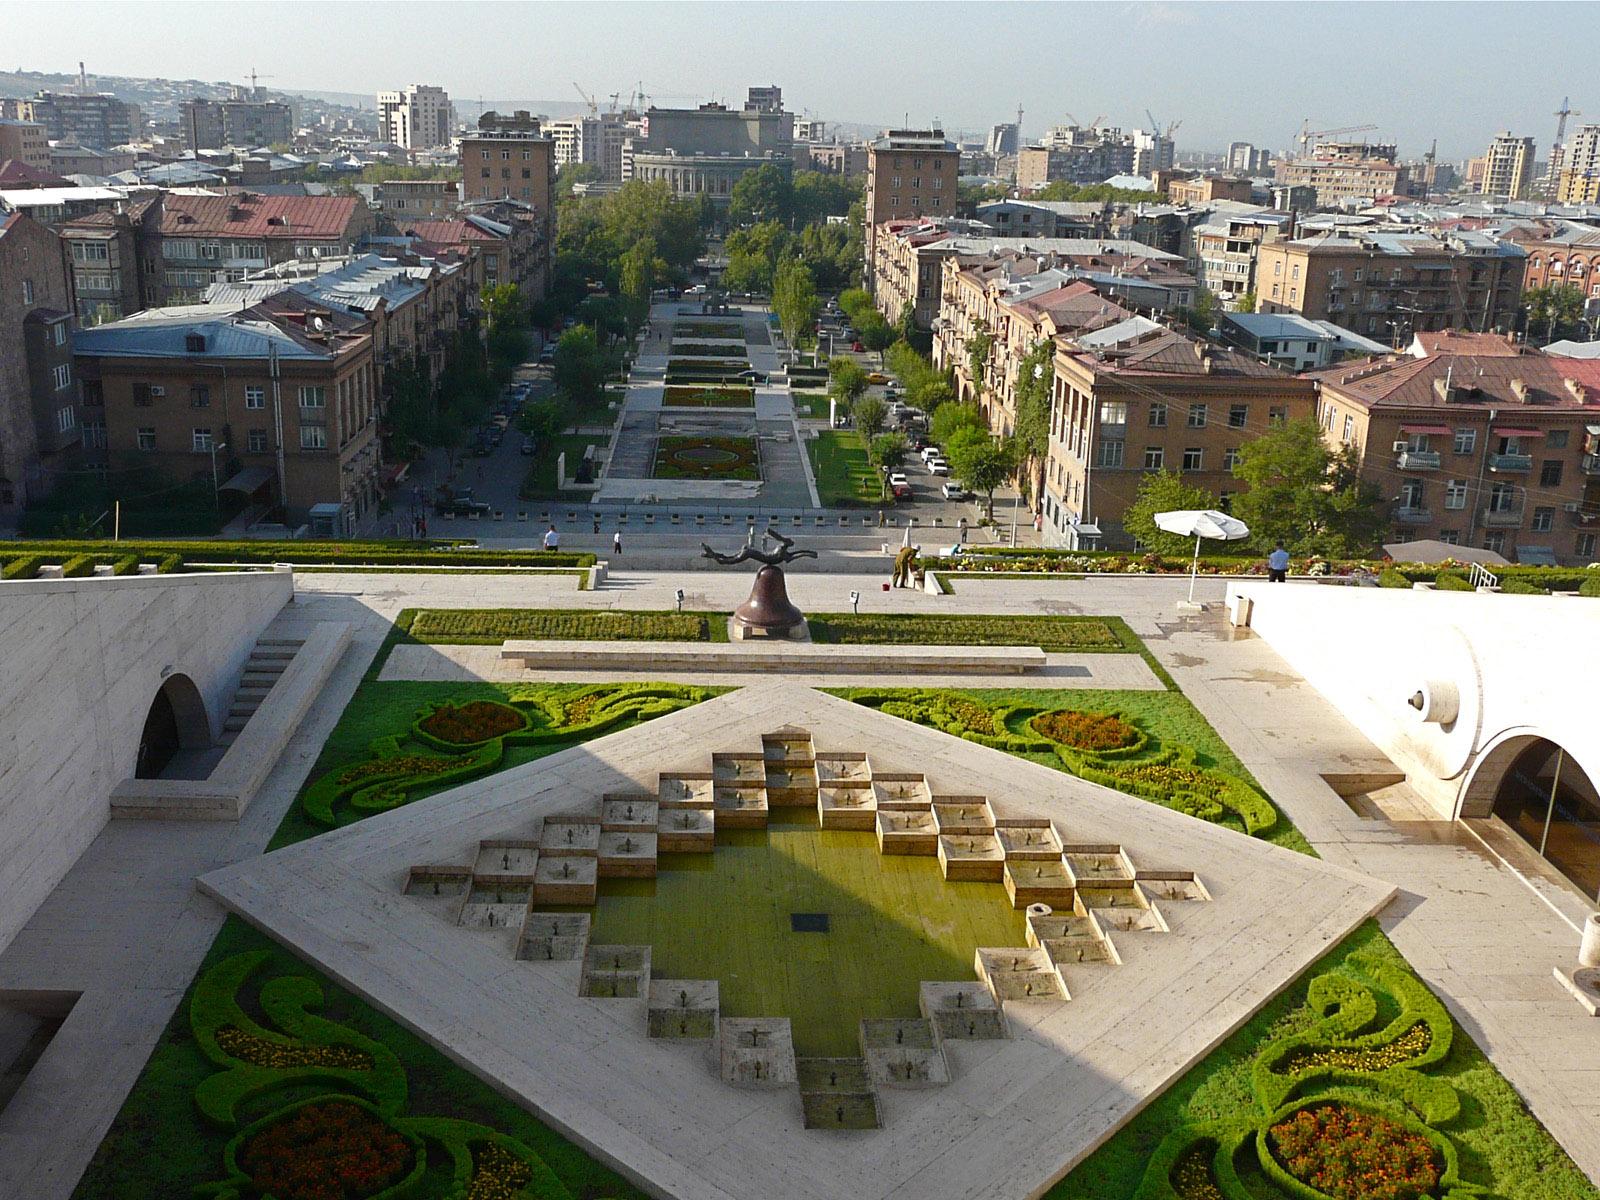 Yerevan city Landscape in Armenia_1600x1200